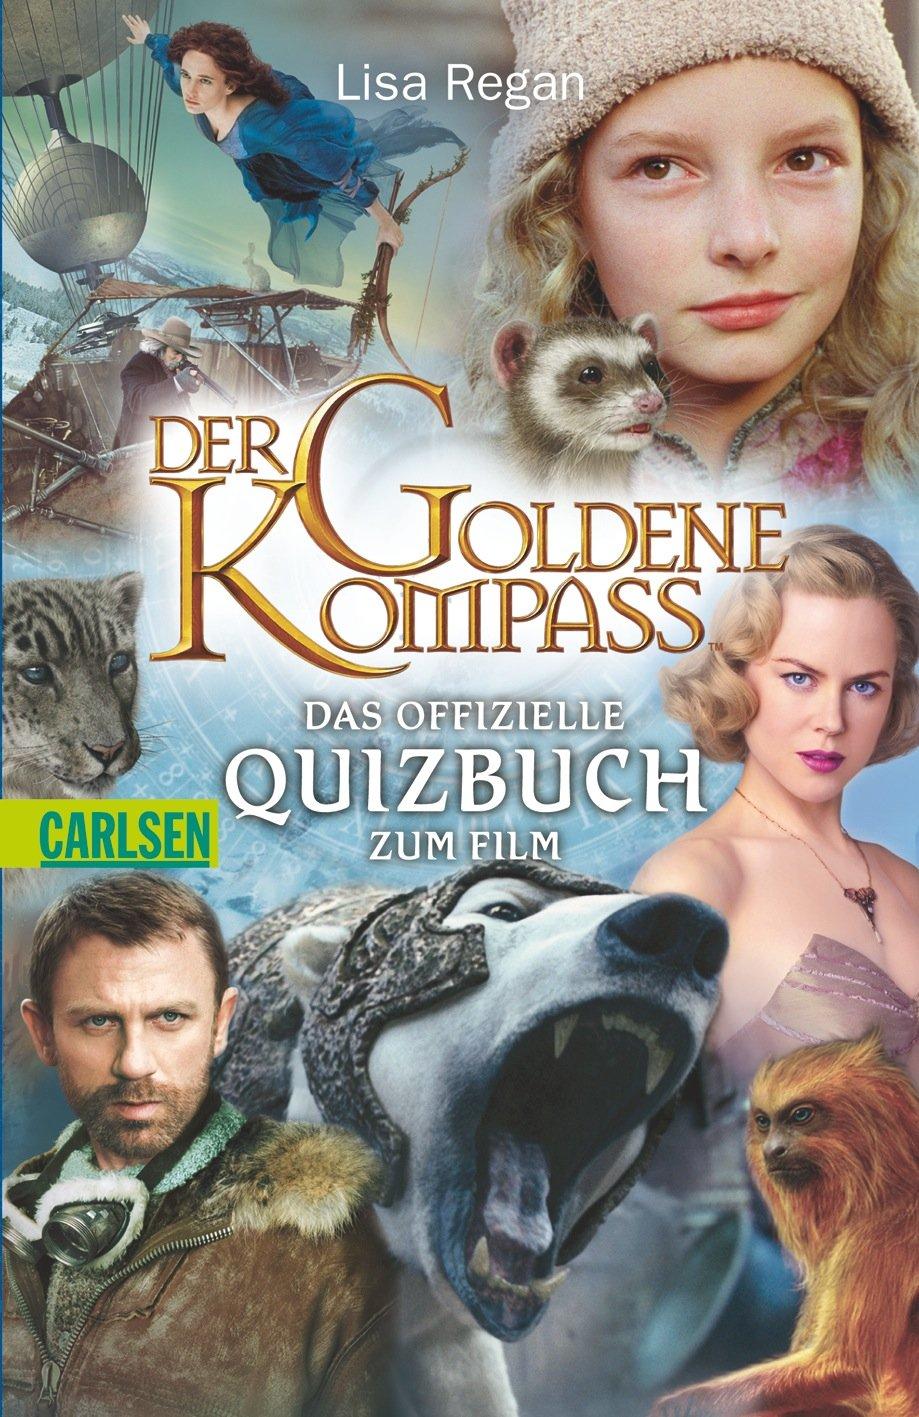 His Dark Materials: Der Goldene Kompass - Quizbuch